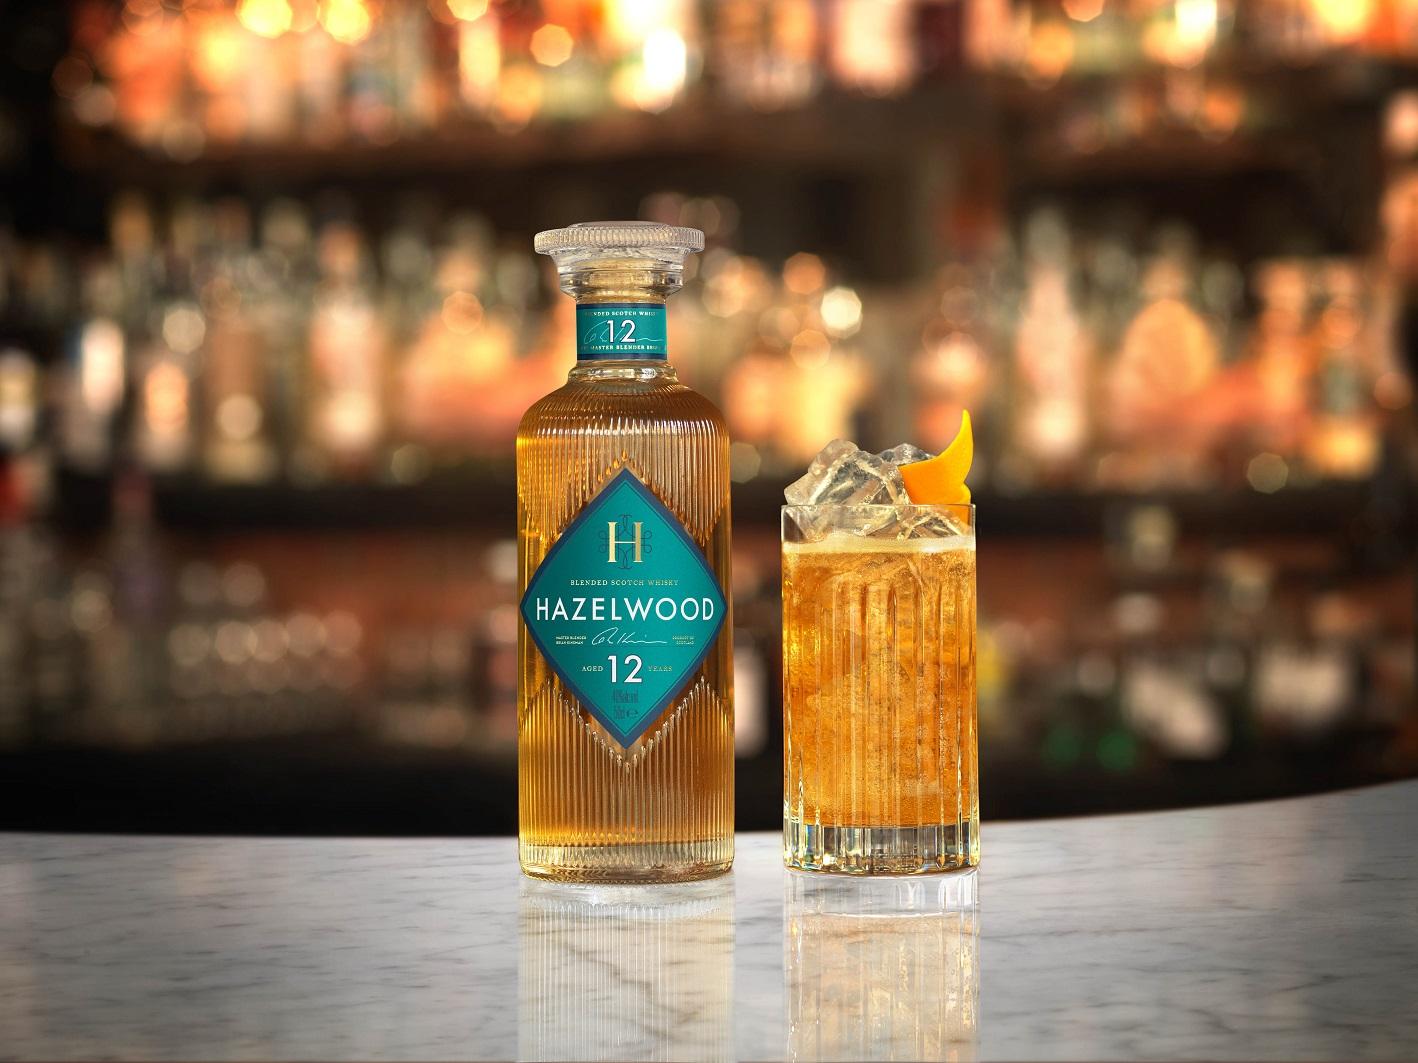 Hazelwood – свежий взгляд на классику виски